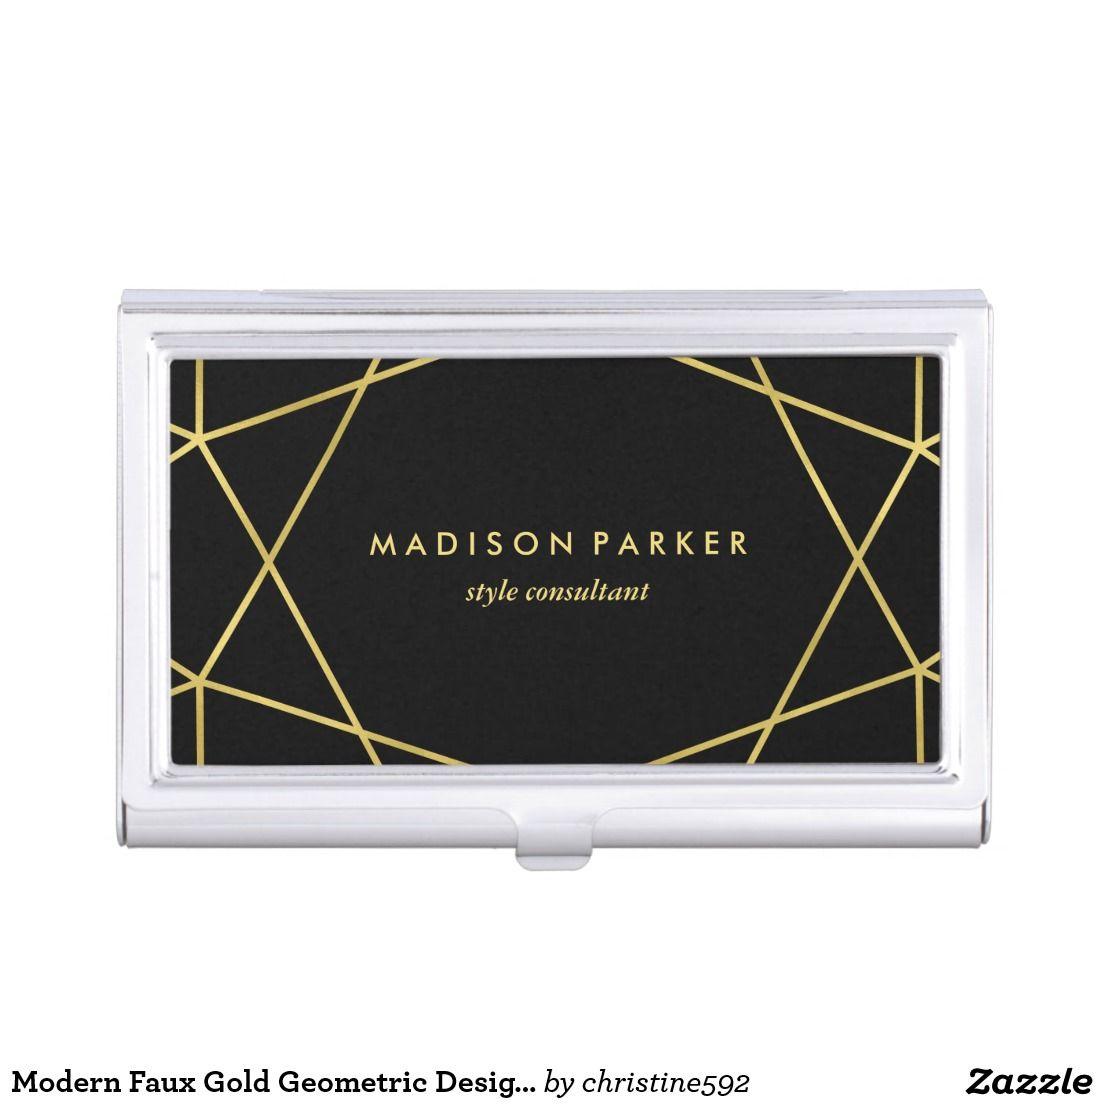 Modern faux gold geometric design on black business card case cool modern faux gold geometric design on black business card case colourmoves